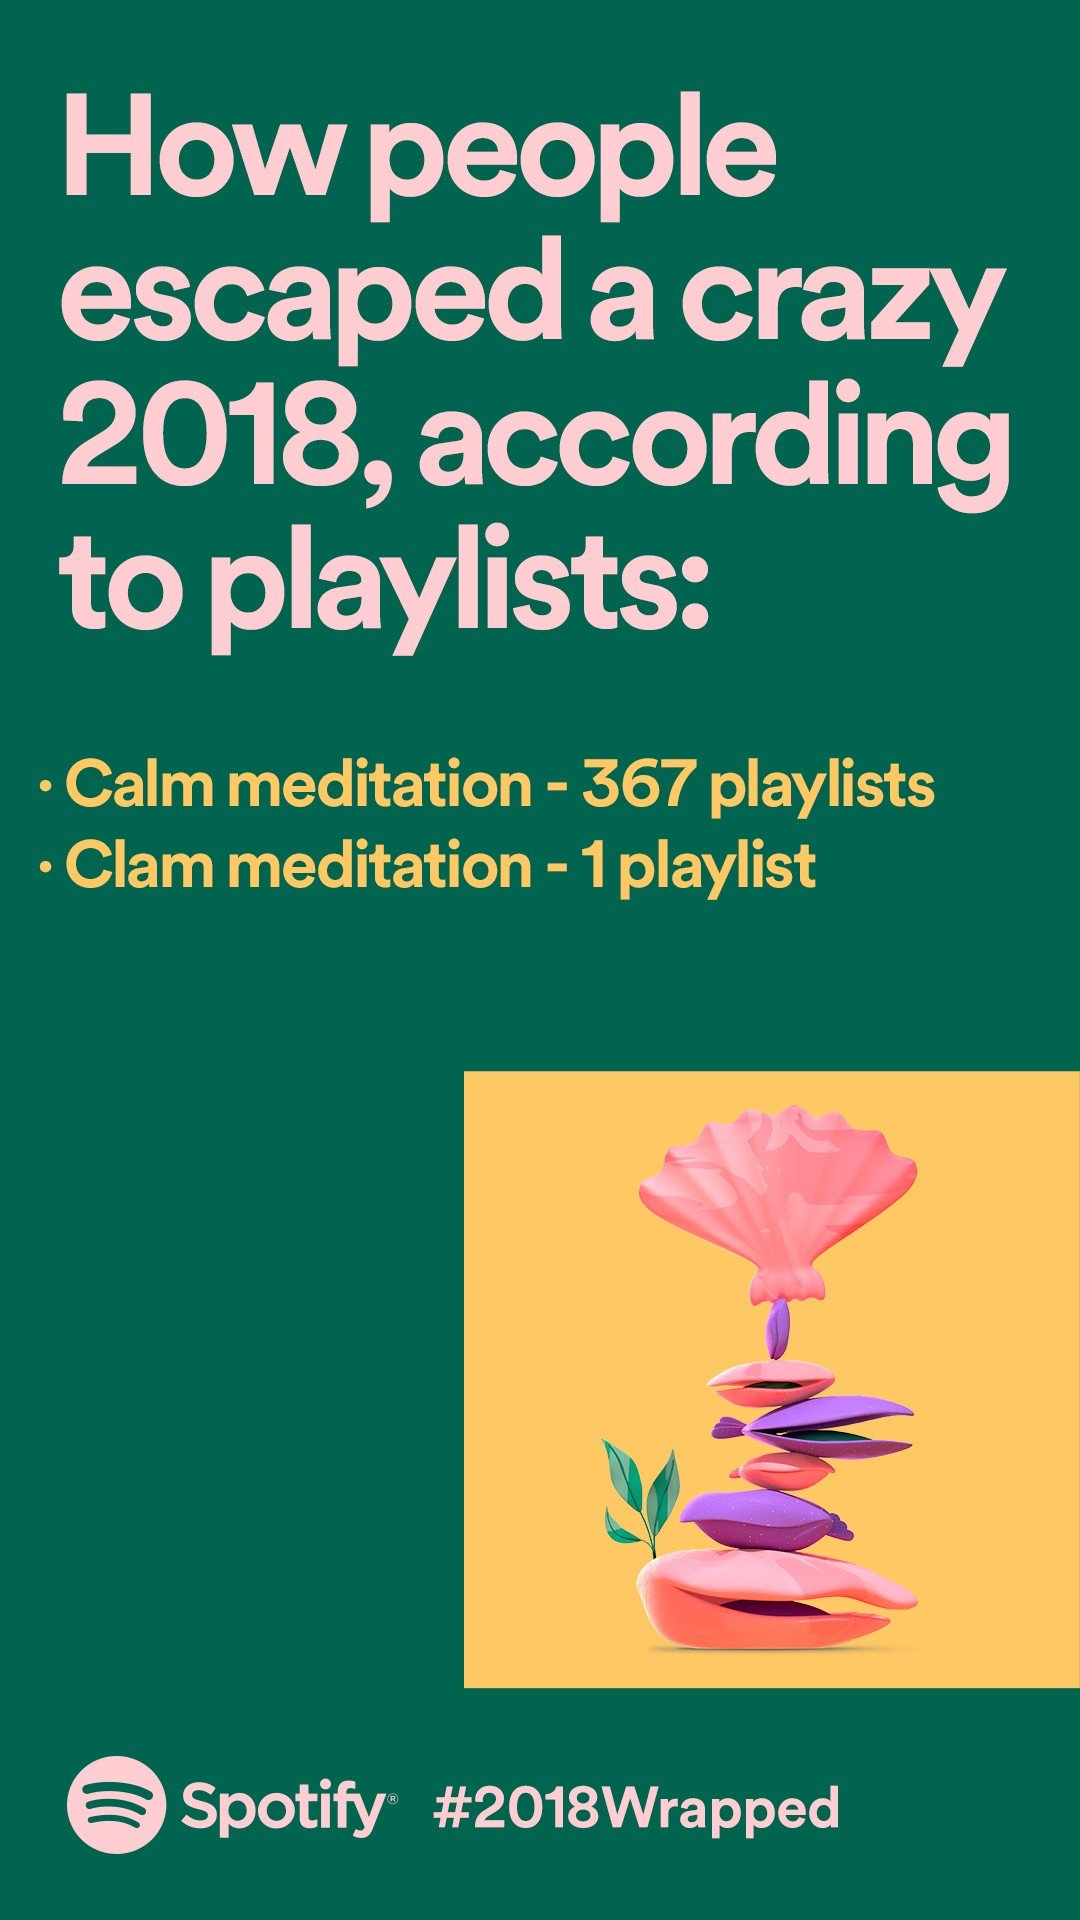 Spotify 又把歌单玩出了花,这是他们第三年用歌单来做盘点_商业_好奇心日报